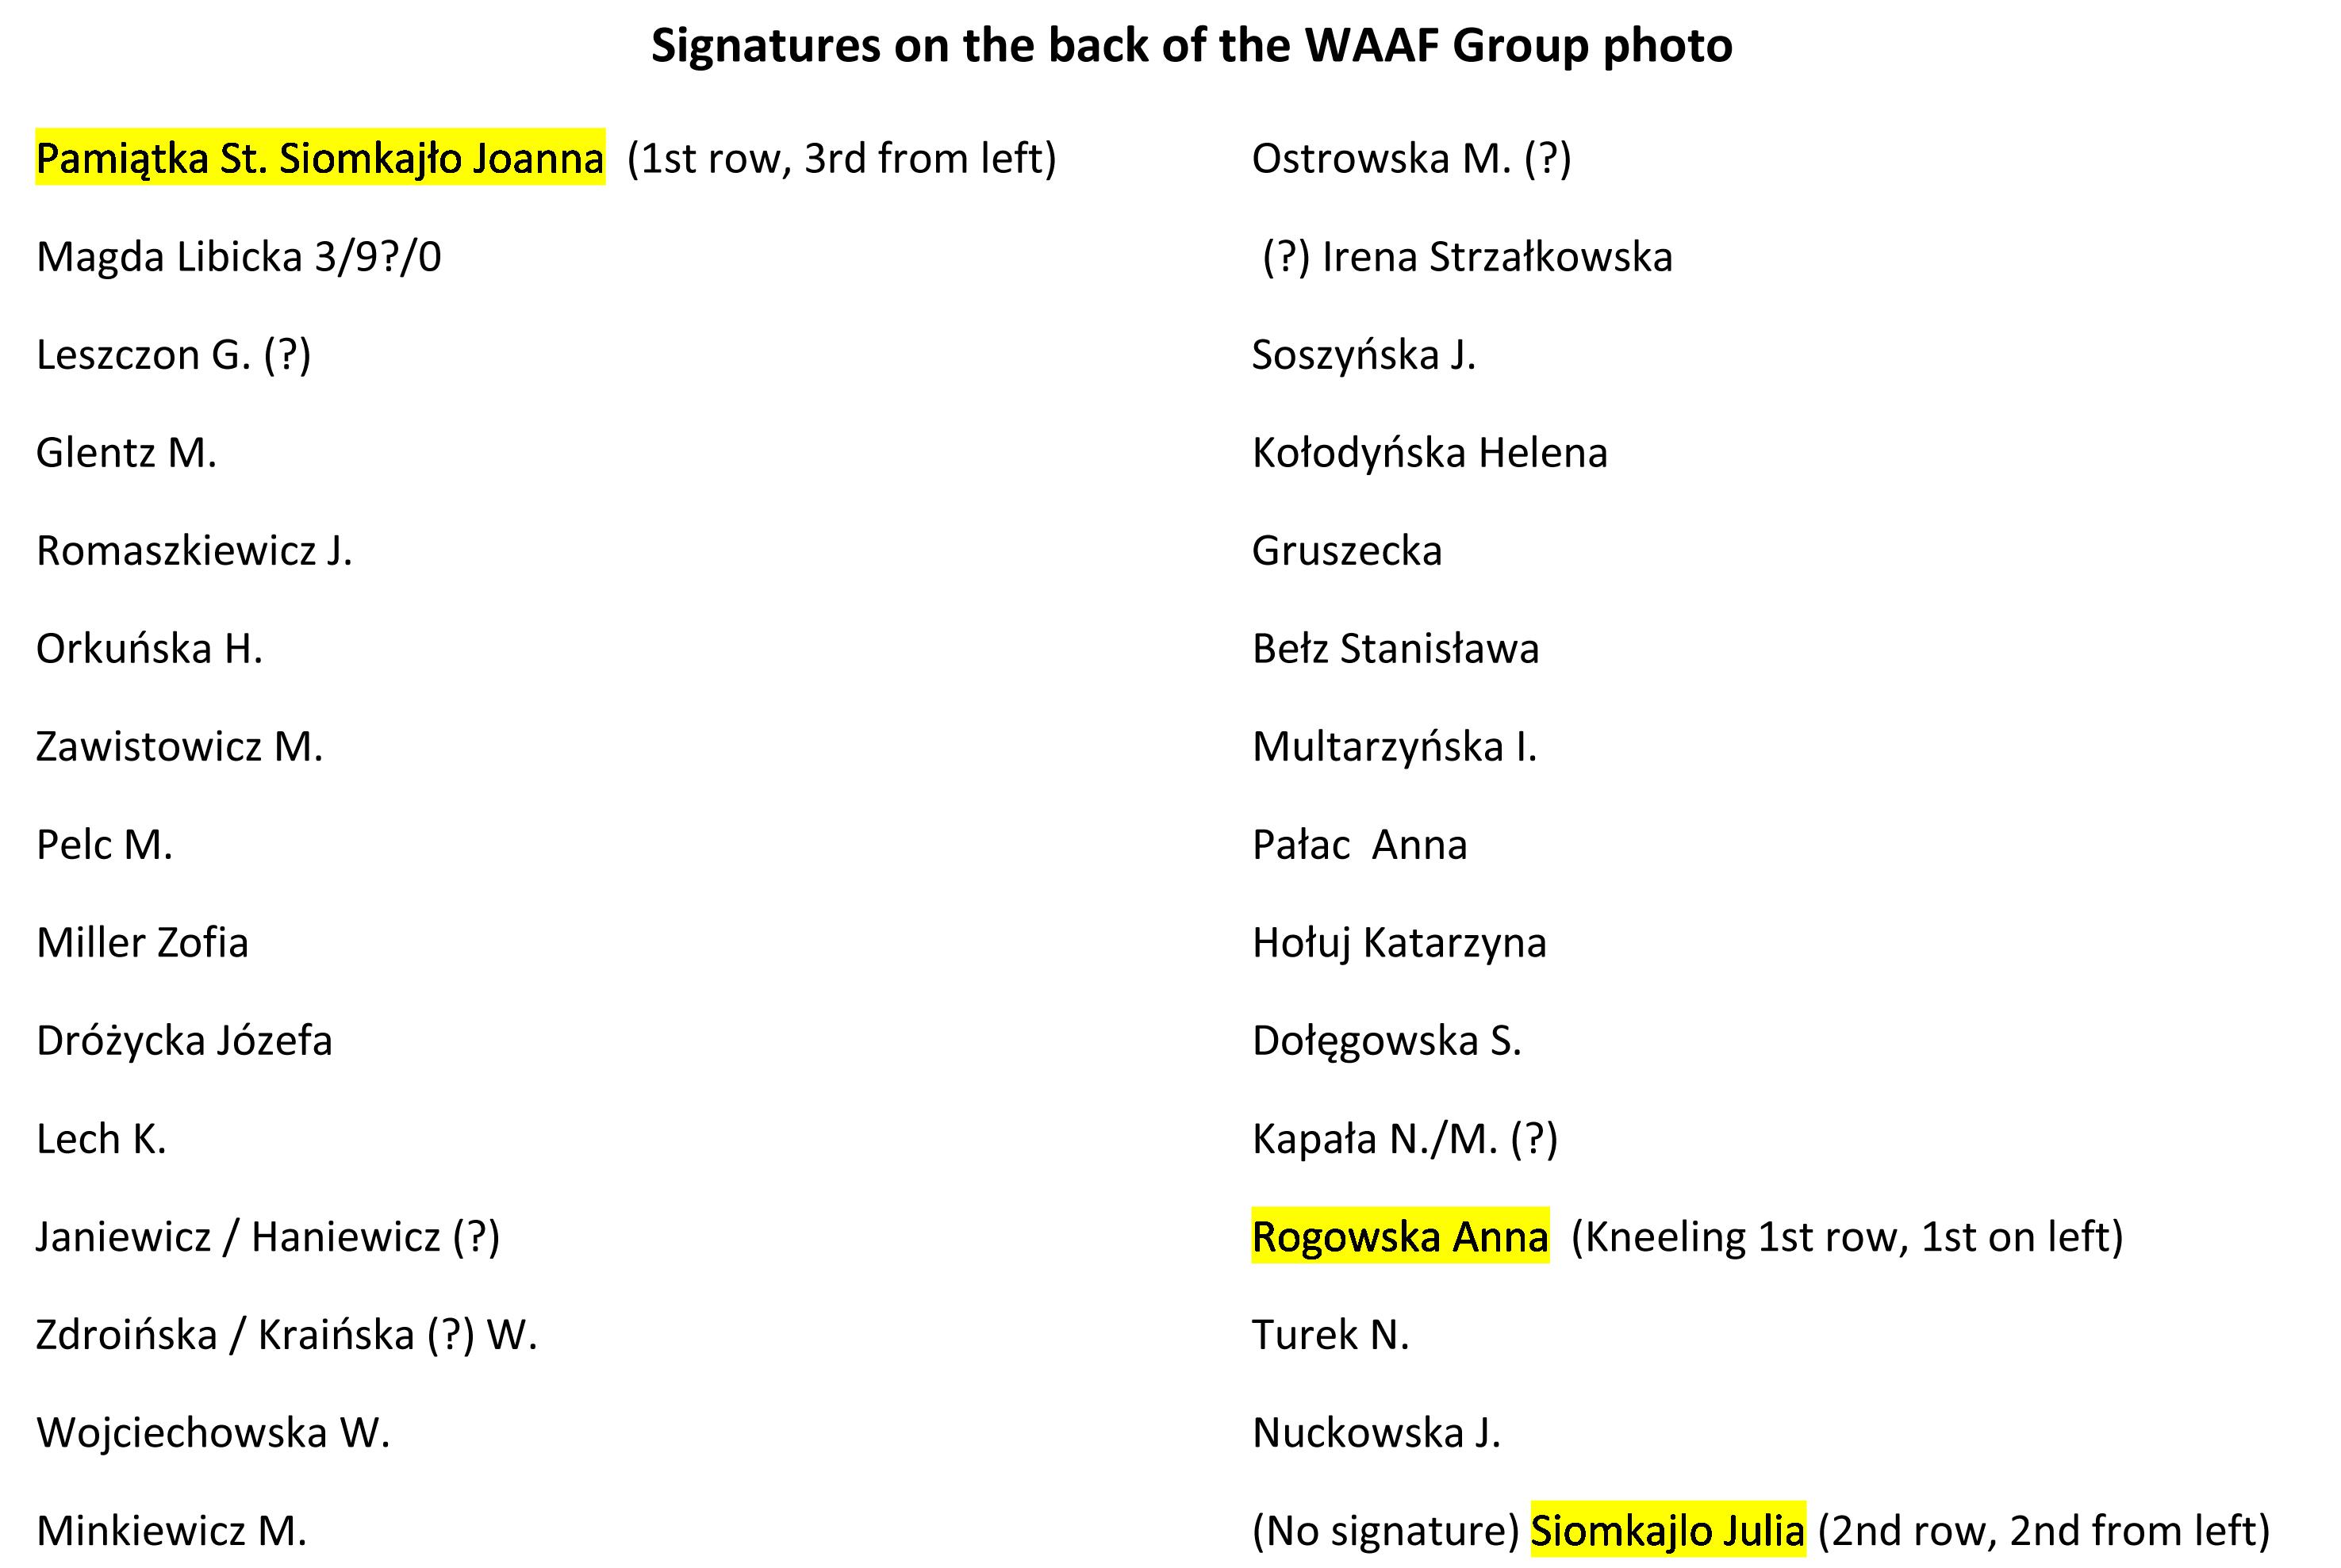 Signatures in typed format